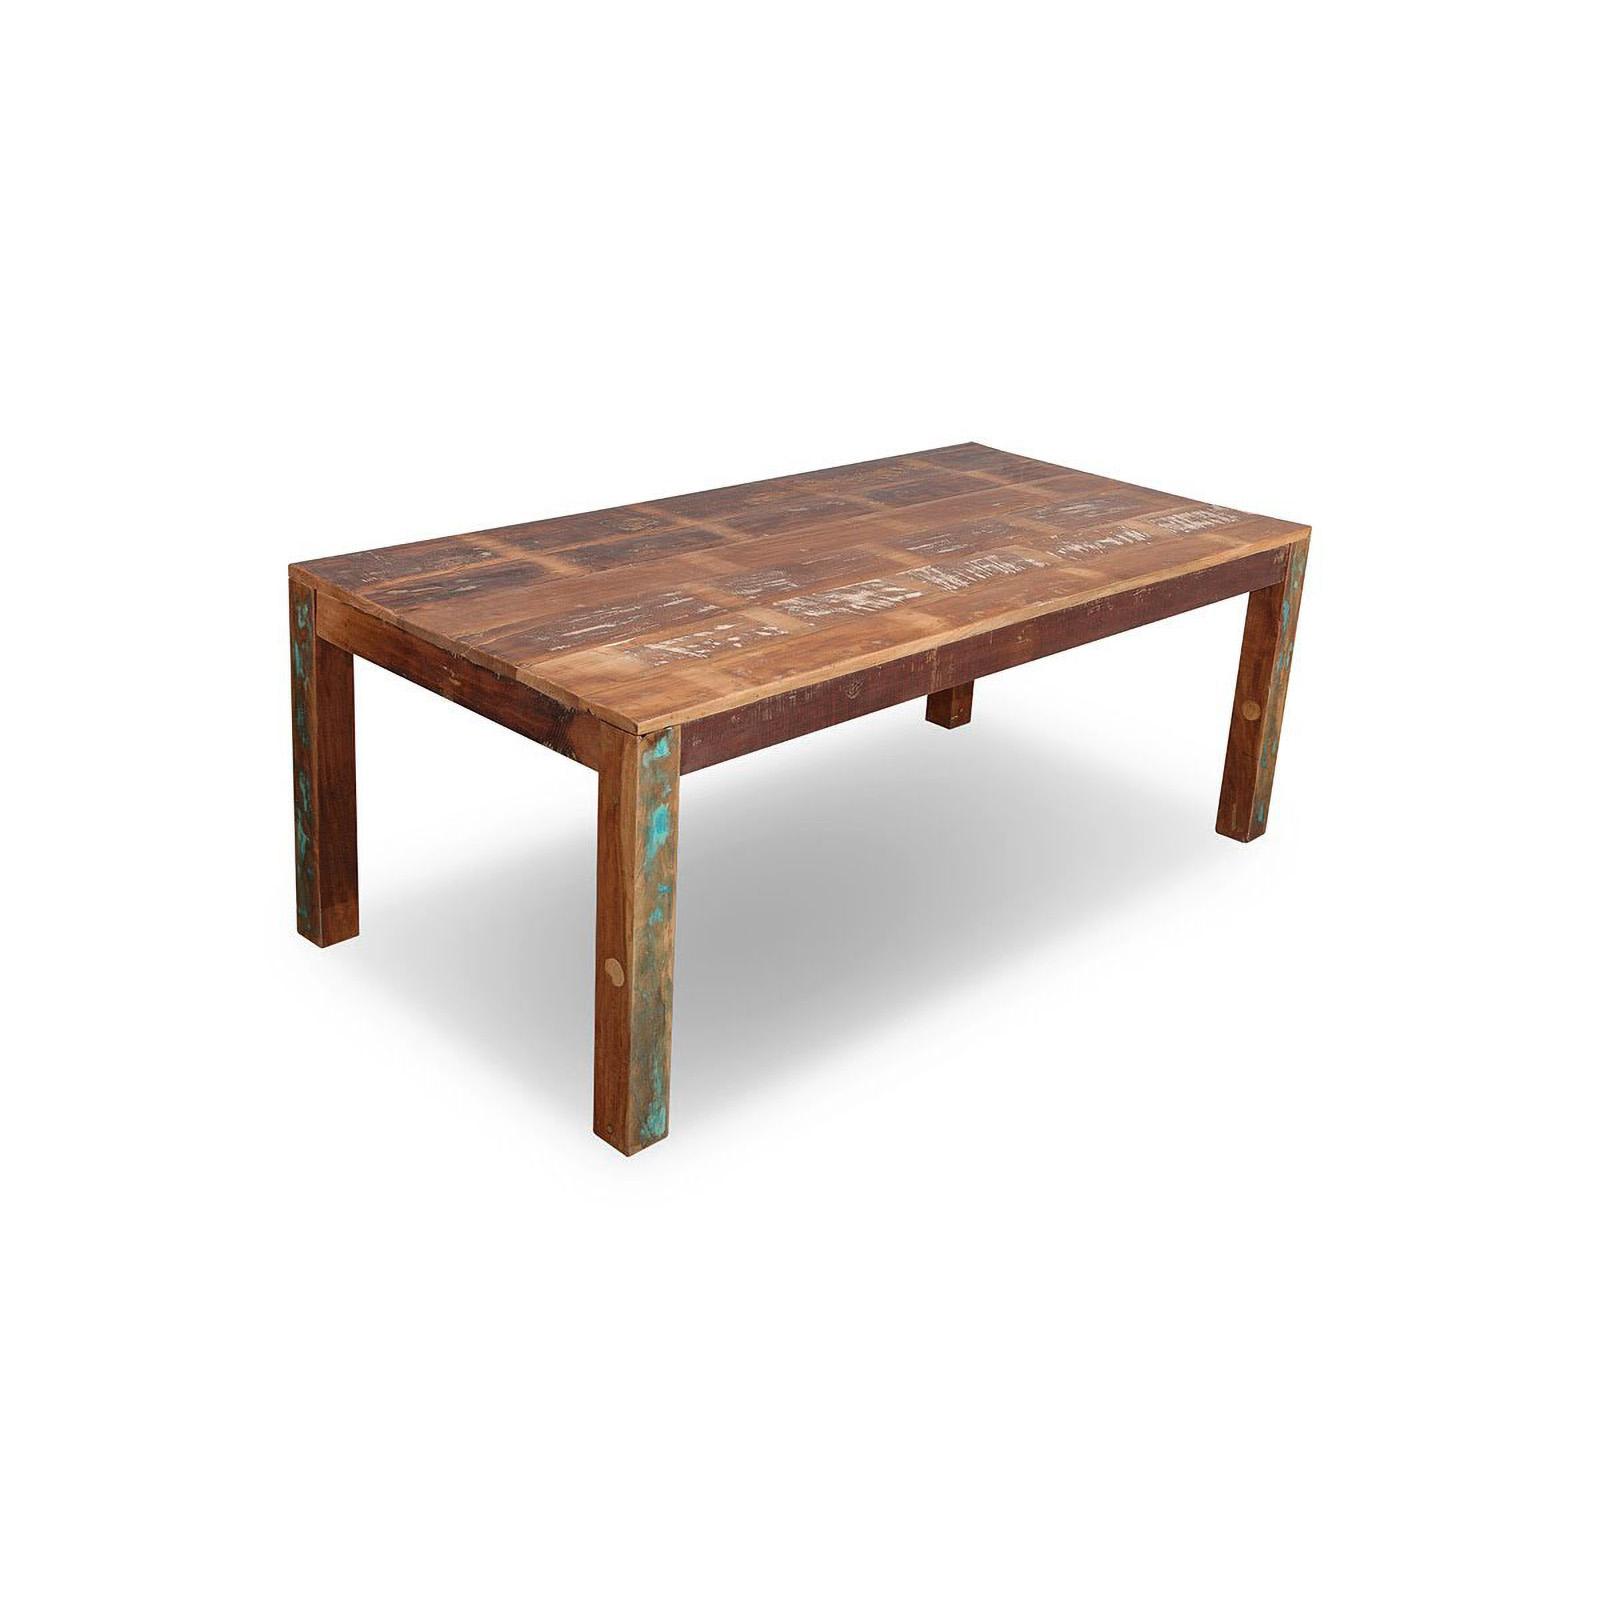 esstisch-malm-aus-recyceltem-massivholz-90-x-180-cm-bunt